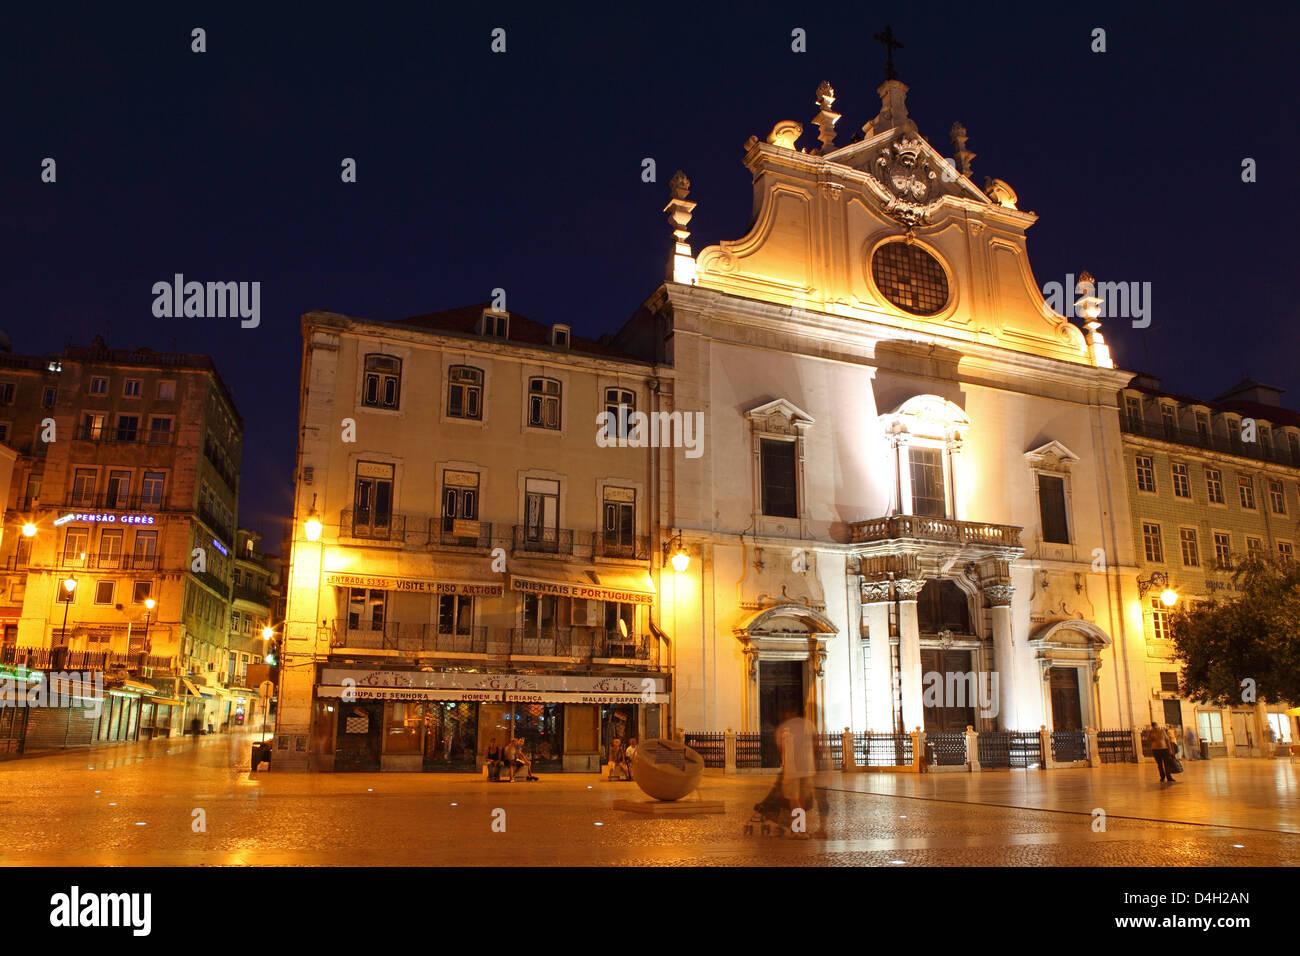 The Baroque style Leitaria Sao Domingos church, illuminated at night, in the Baixa district, Lisbon, Portugal - Stock Image